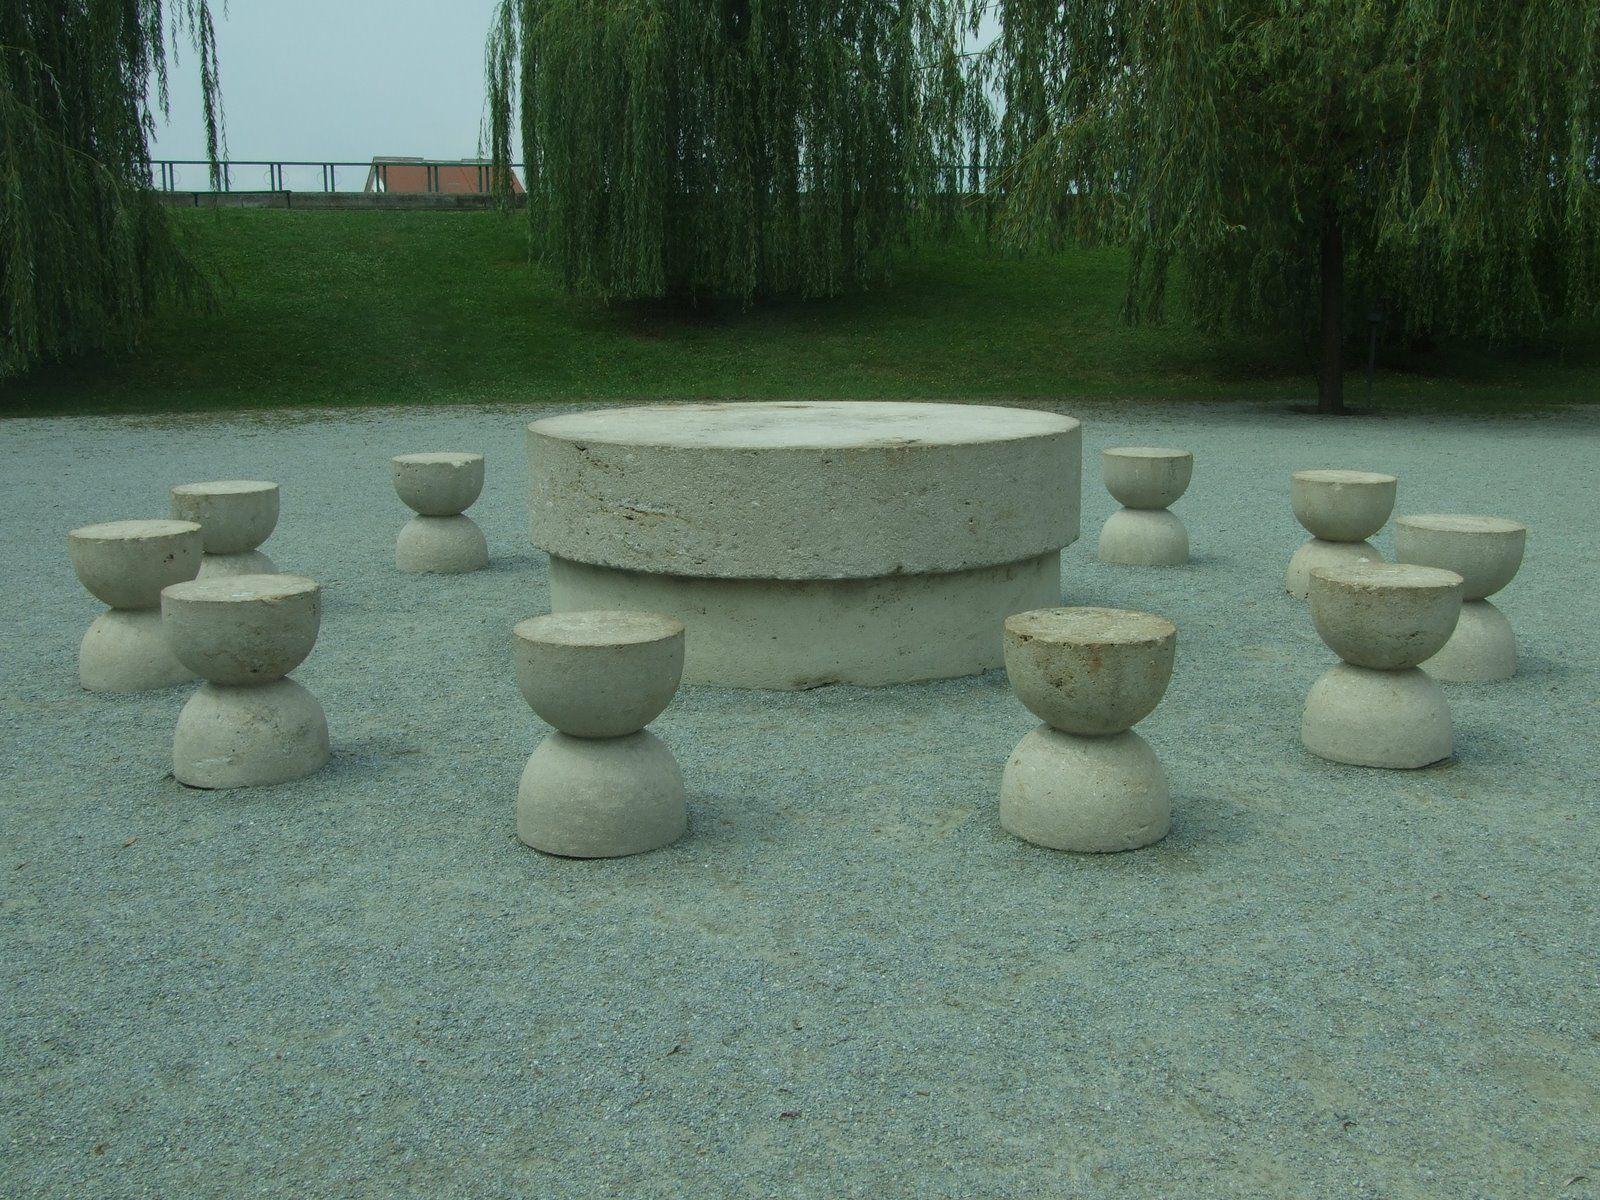 Table of Silence - Constantin Brancusi, 1907 | Installazioni ... for Brancusi Table Of Silence  183qdu